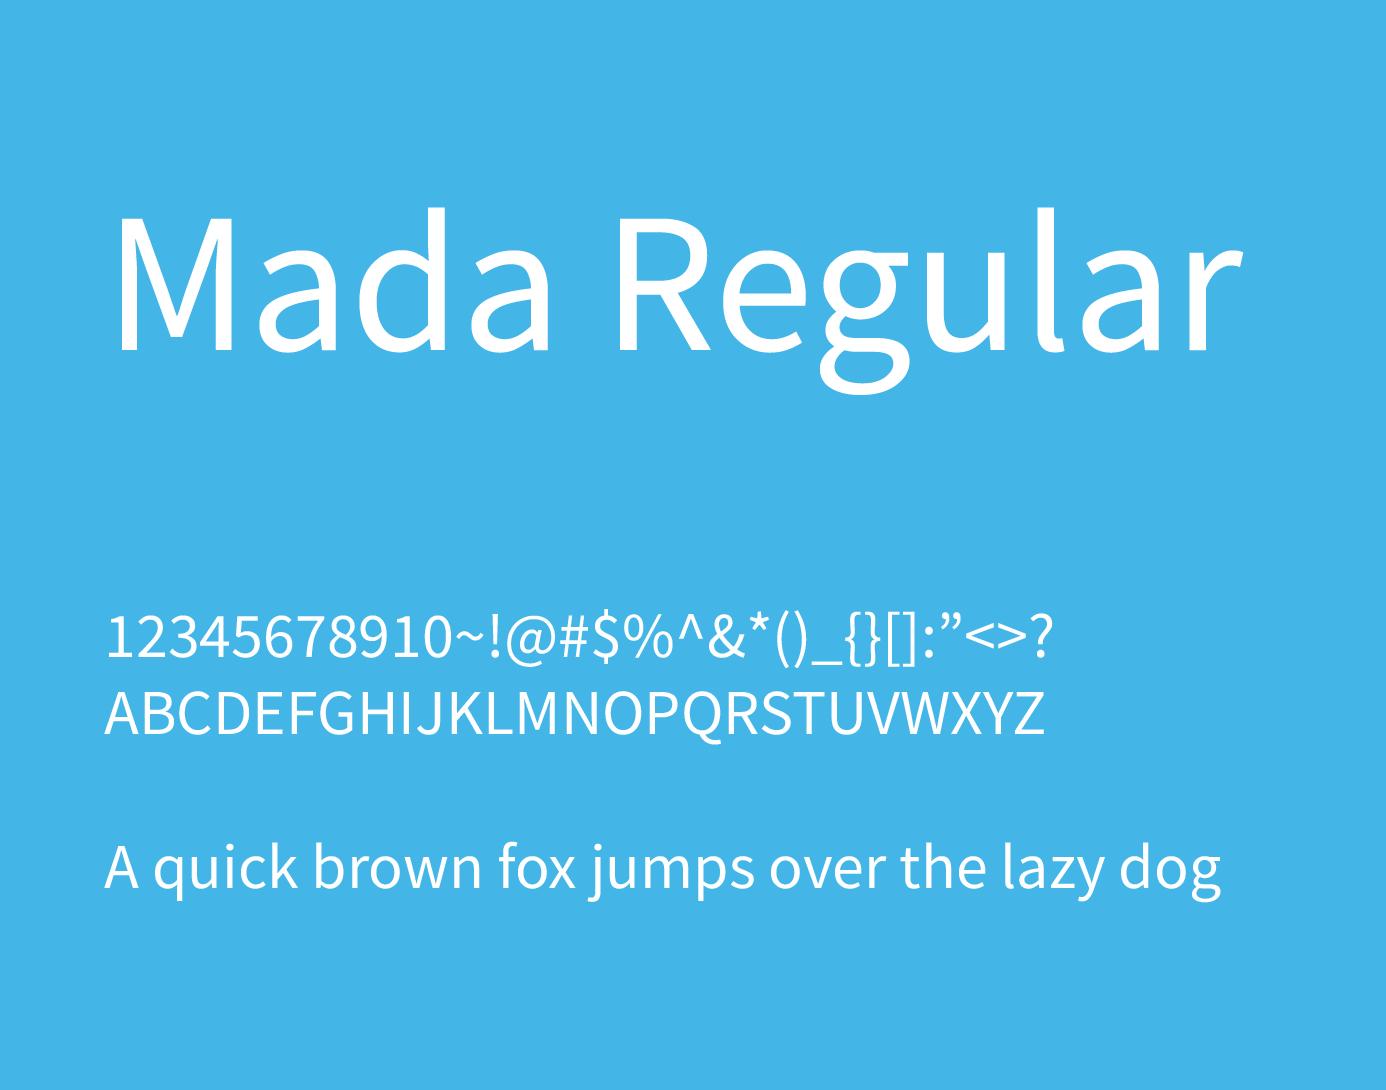 mada regular